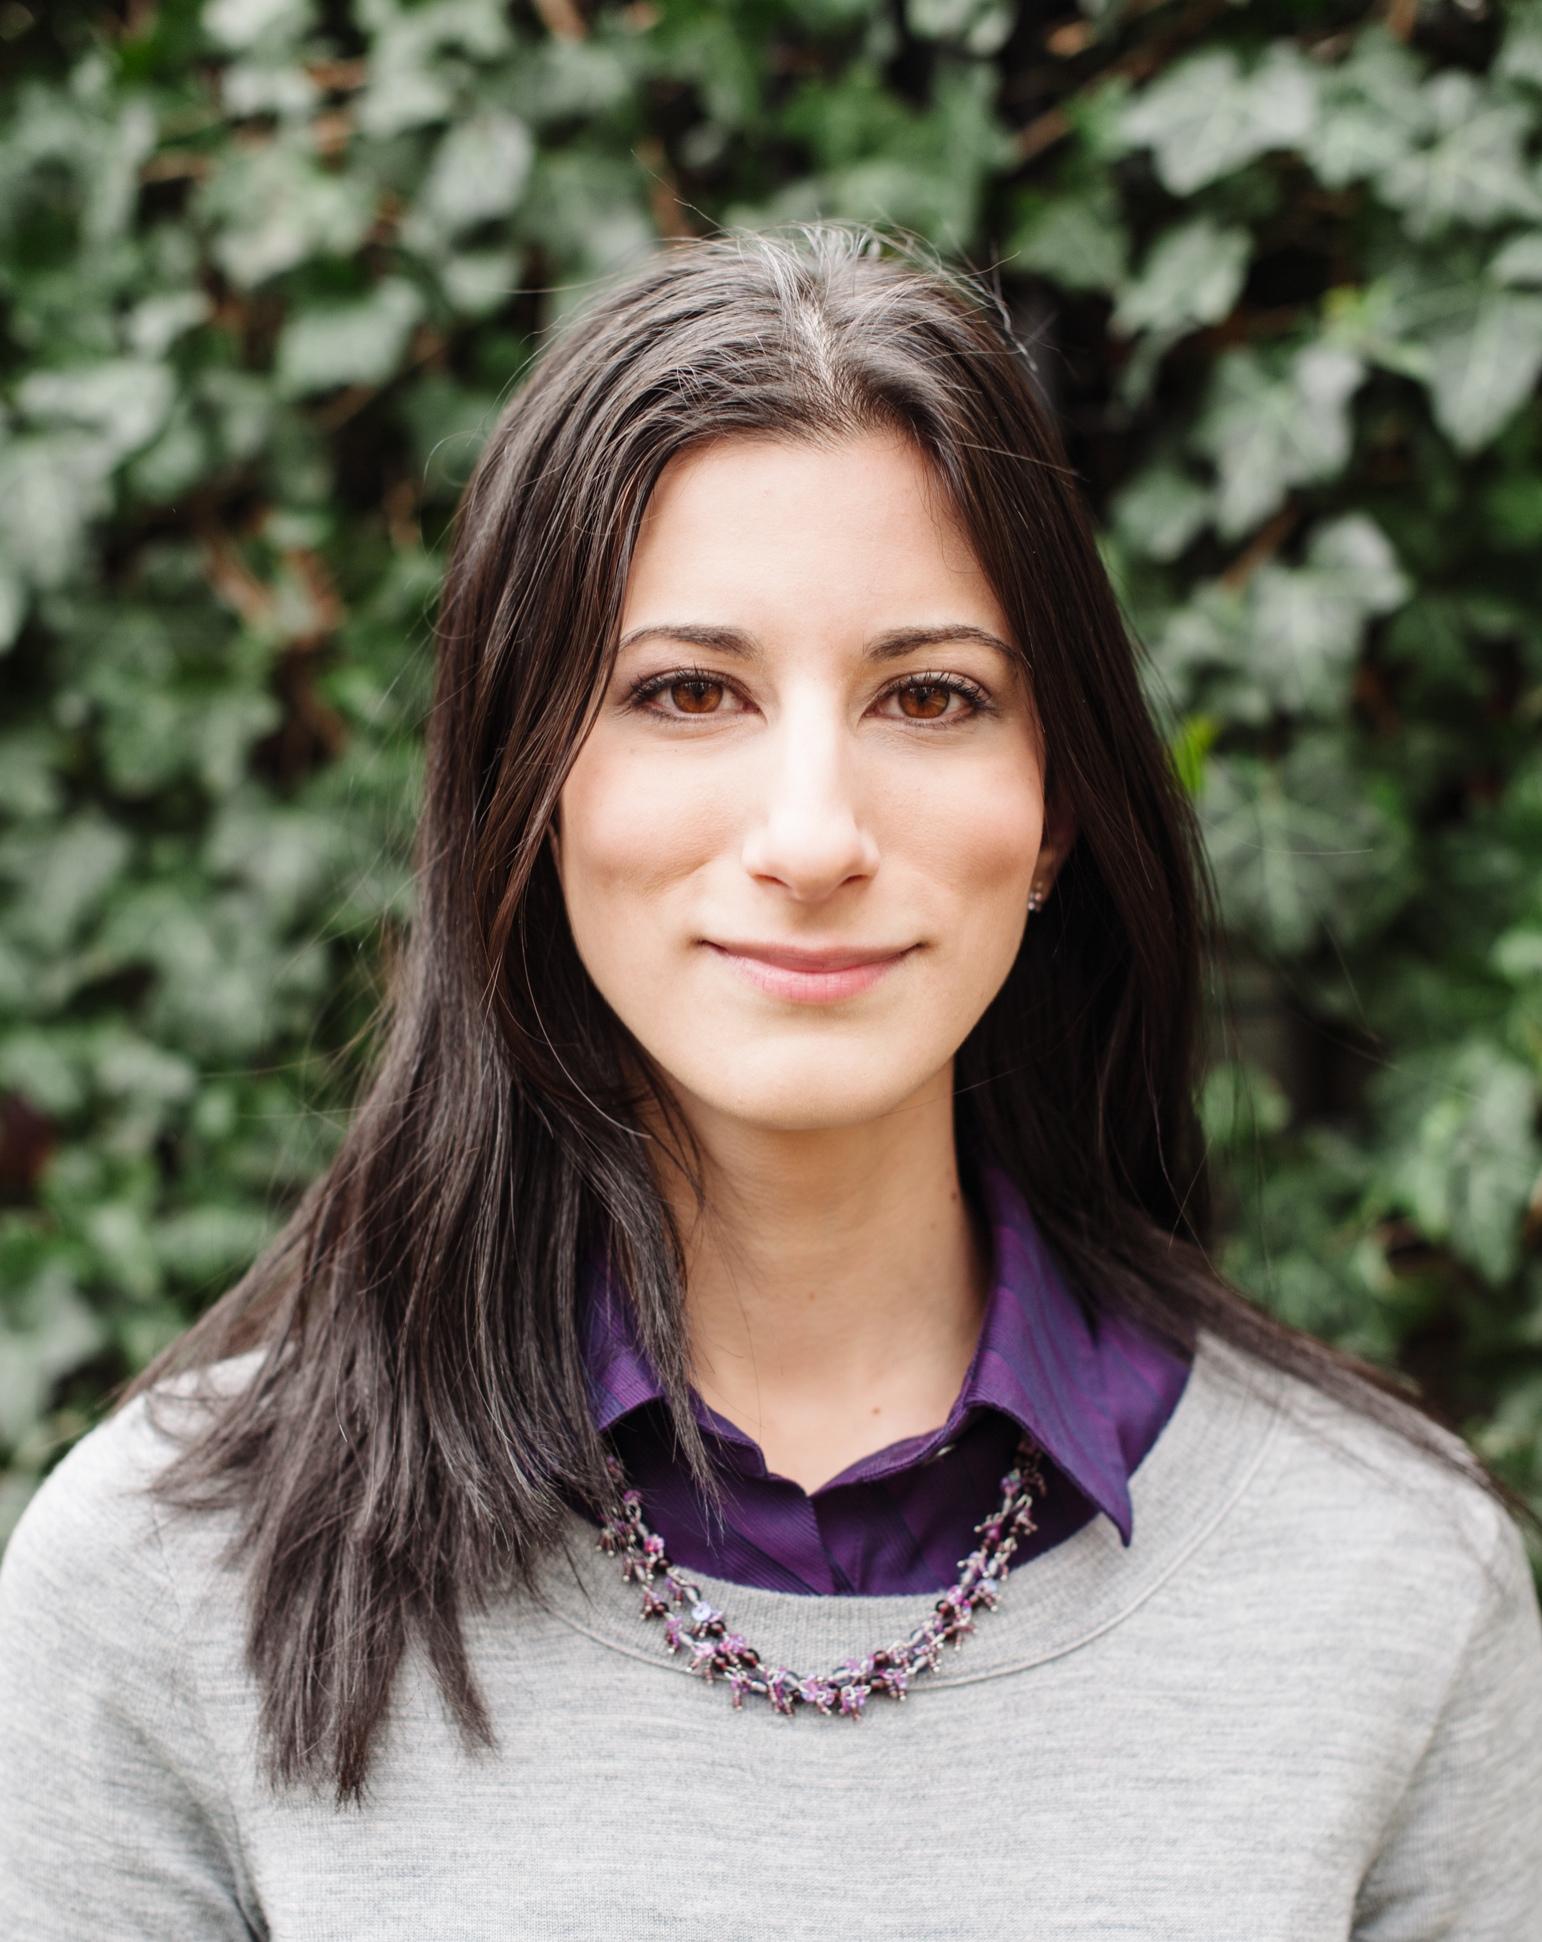 Jess Edelstein, PiperWai Cosmetics